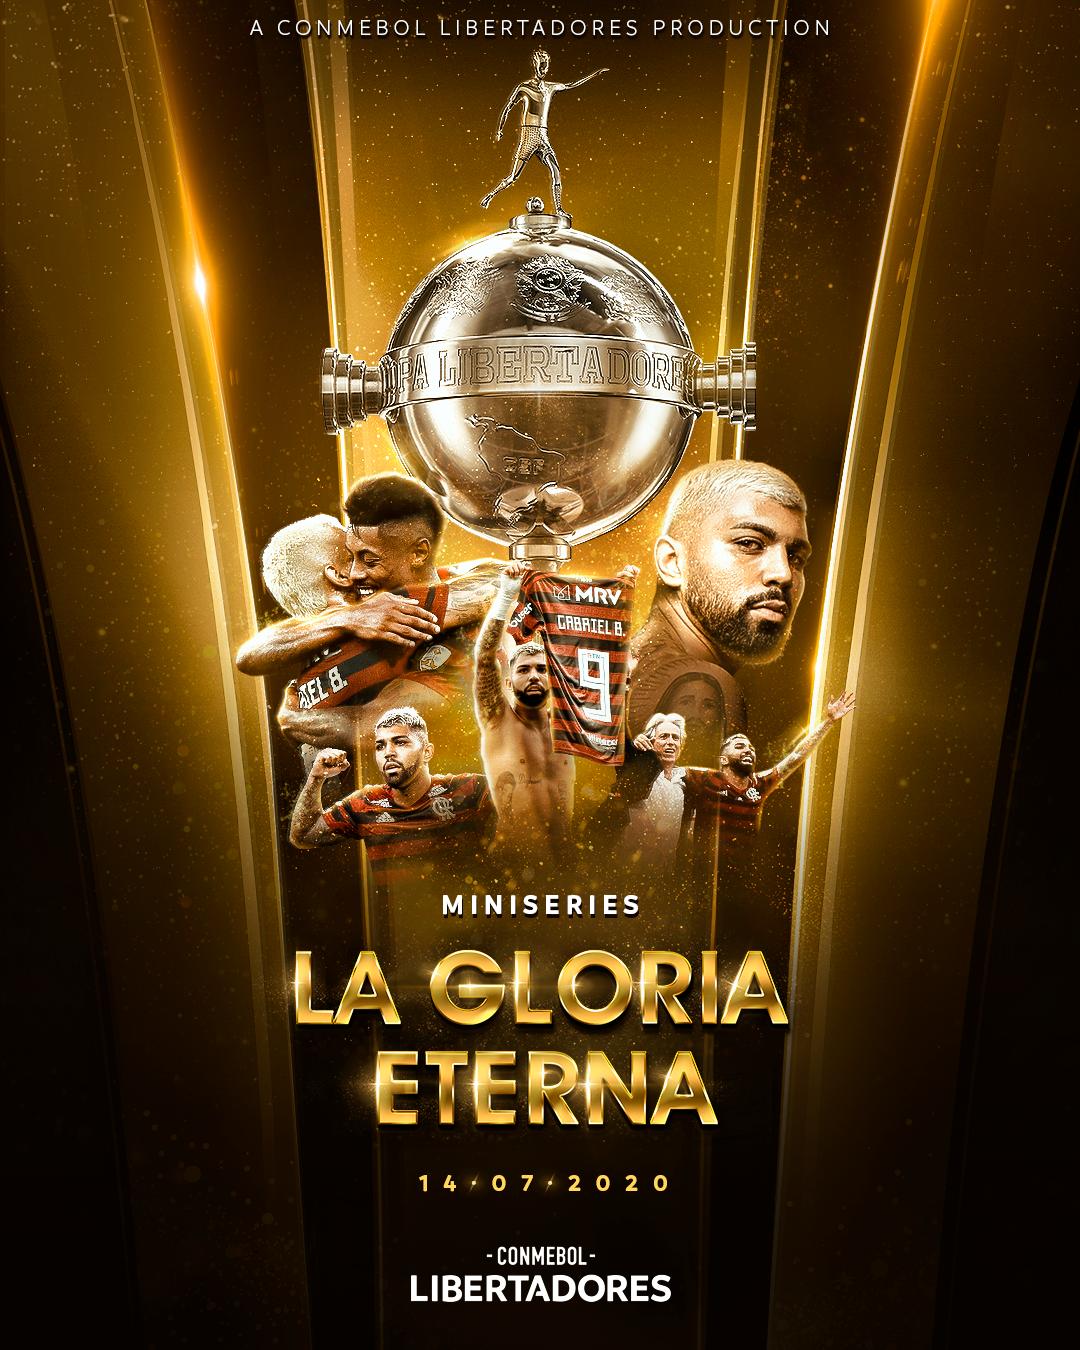 La Gloria Eterna poster